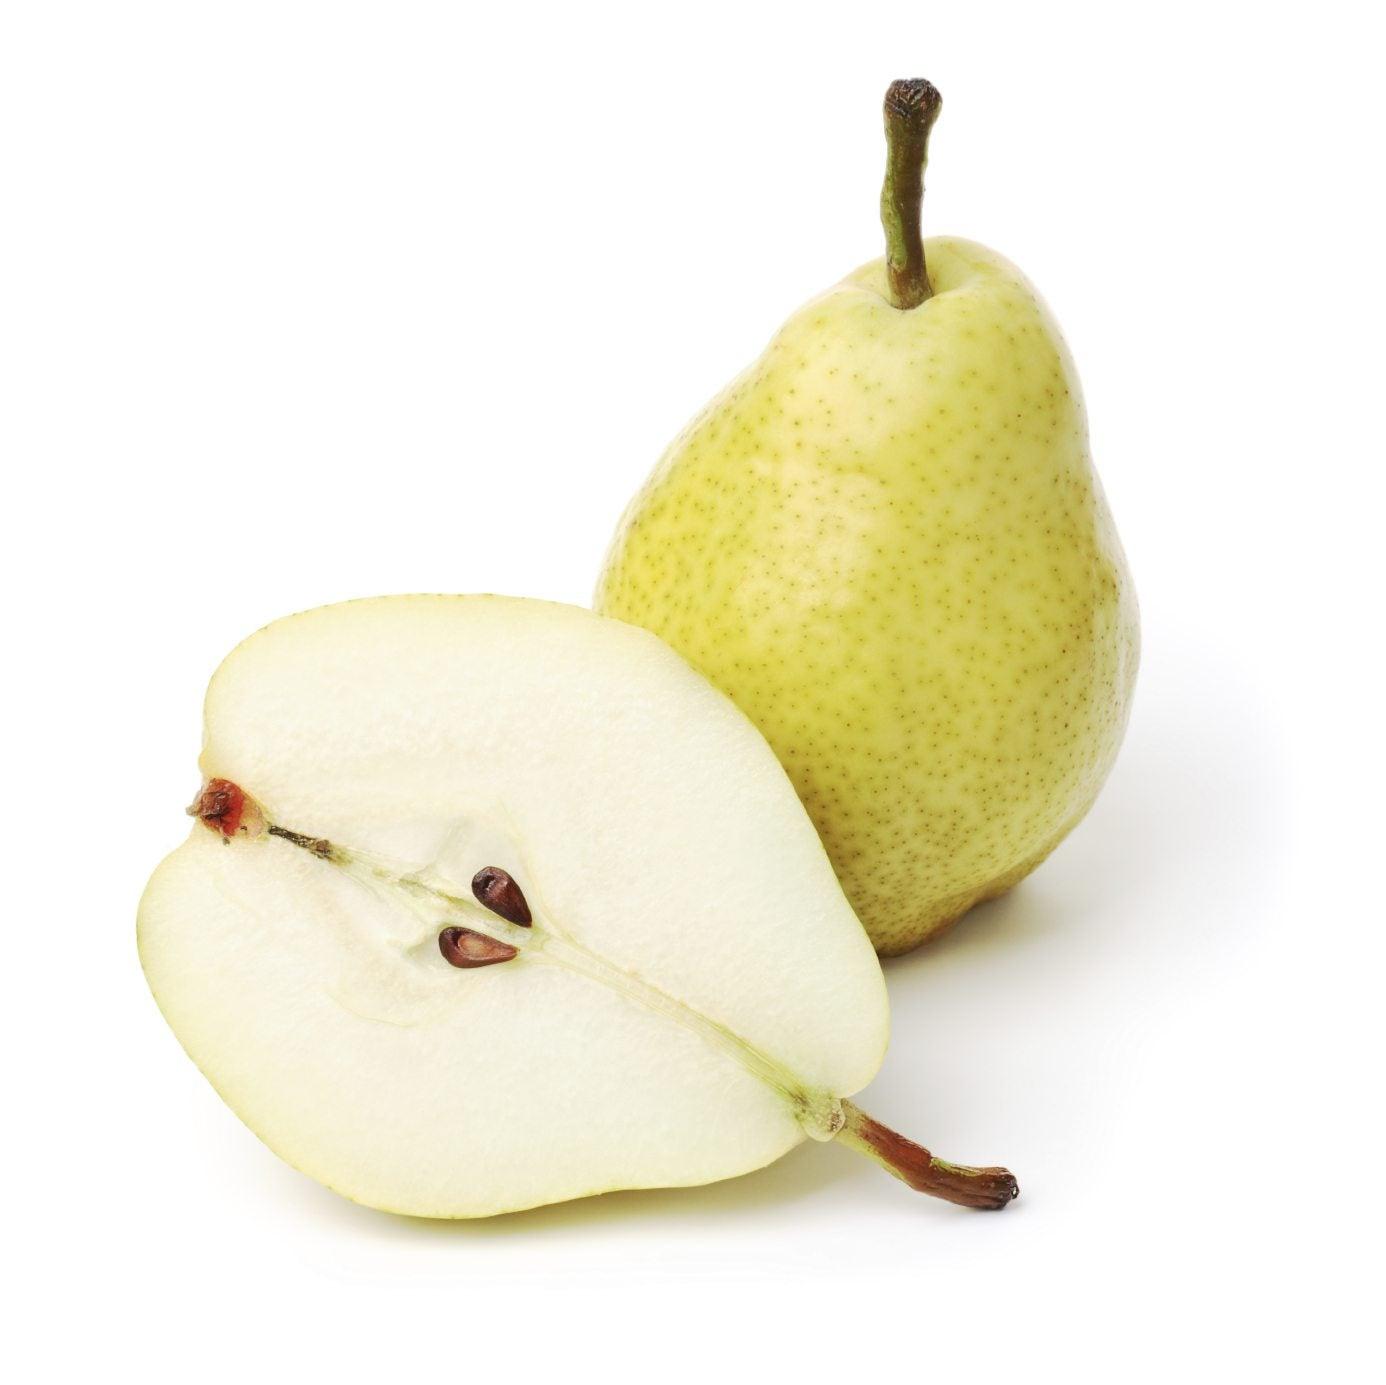 pear seeds